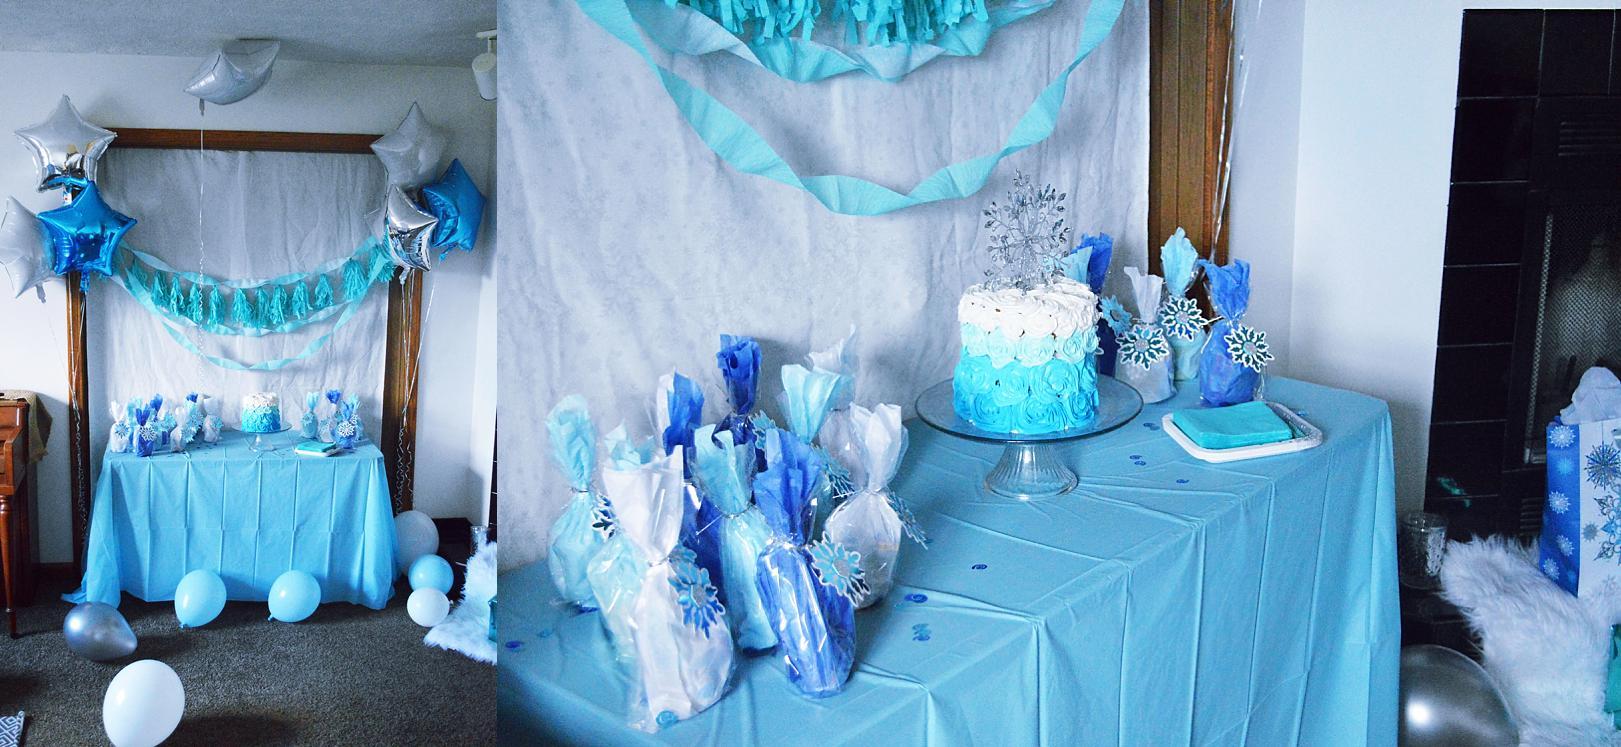 Diy Frozen Party Easy Beautiful Frozen Cake Frozen Party Games Rachael Burgess